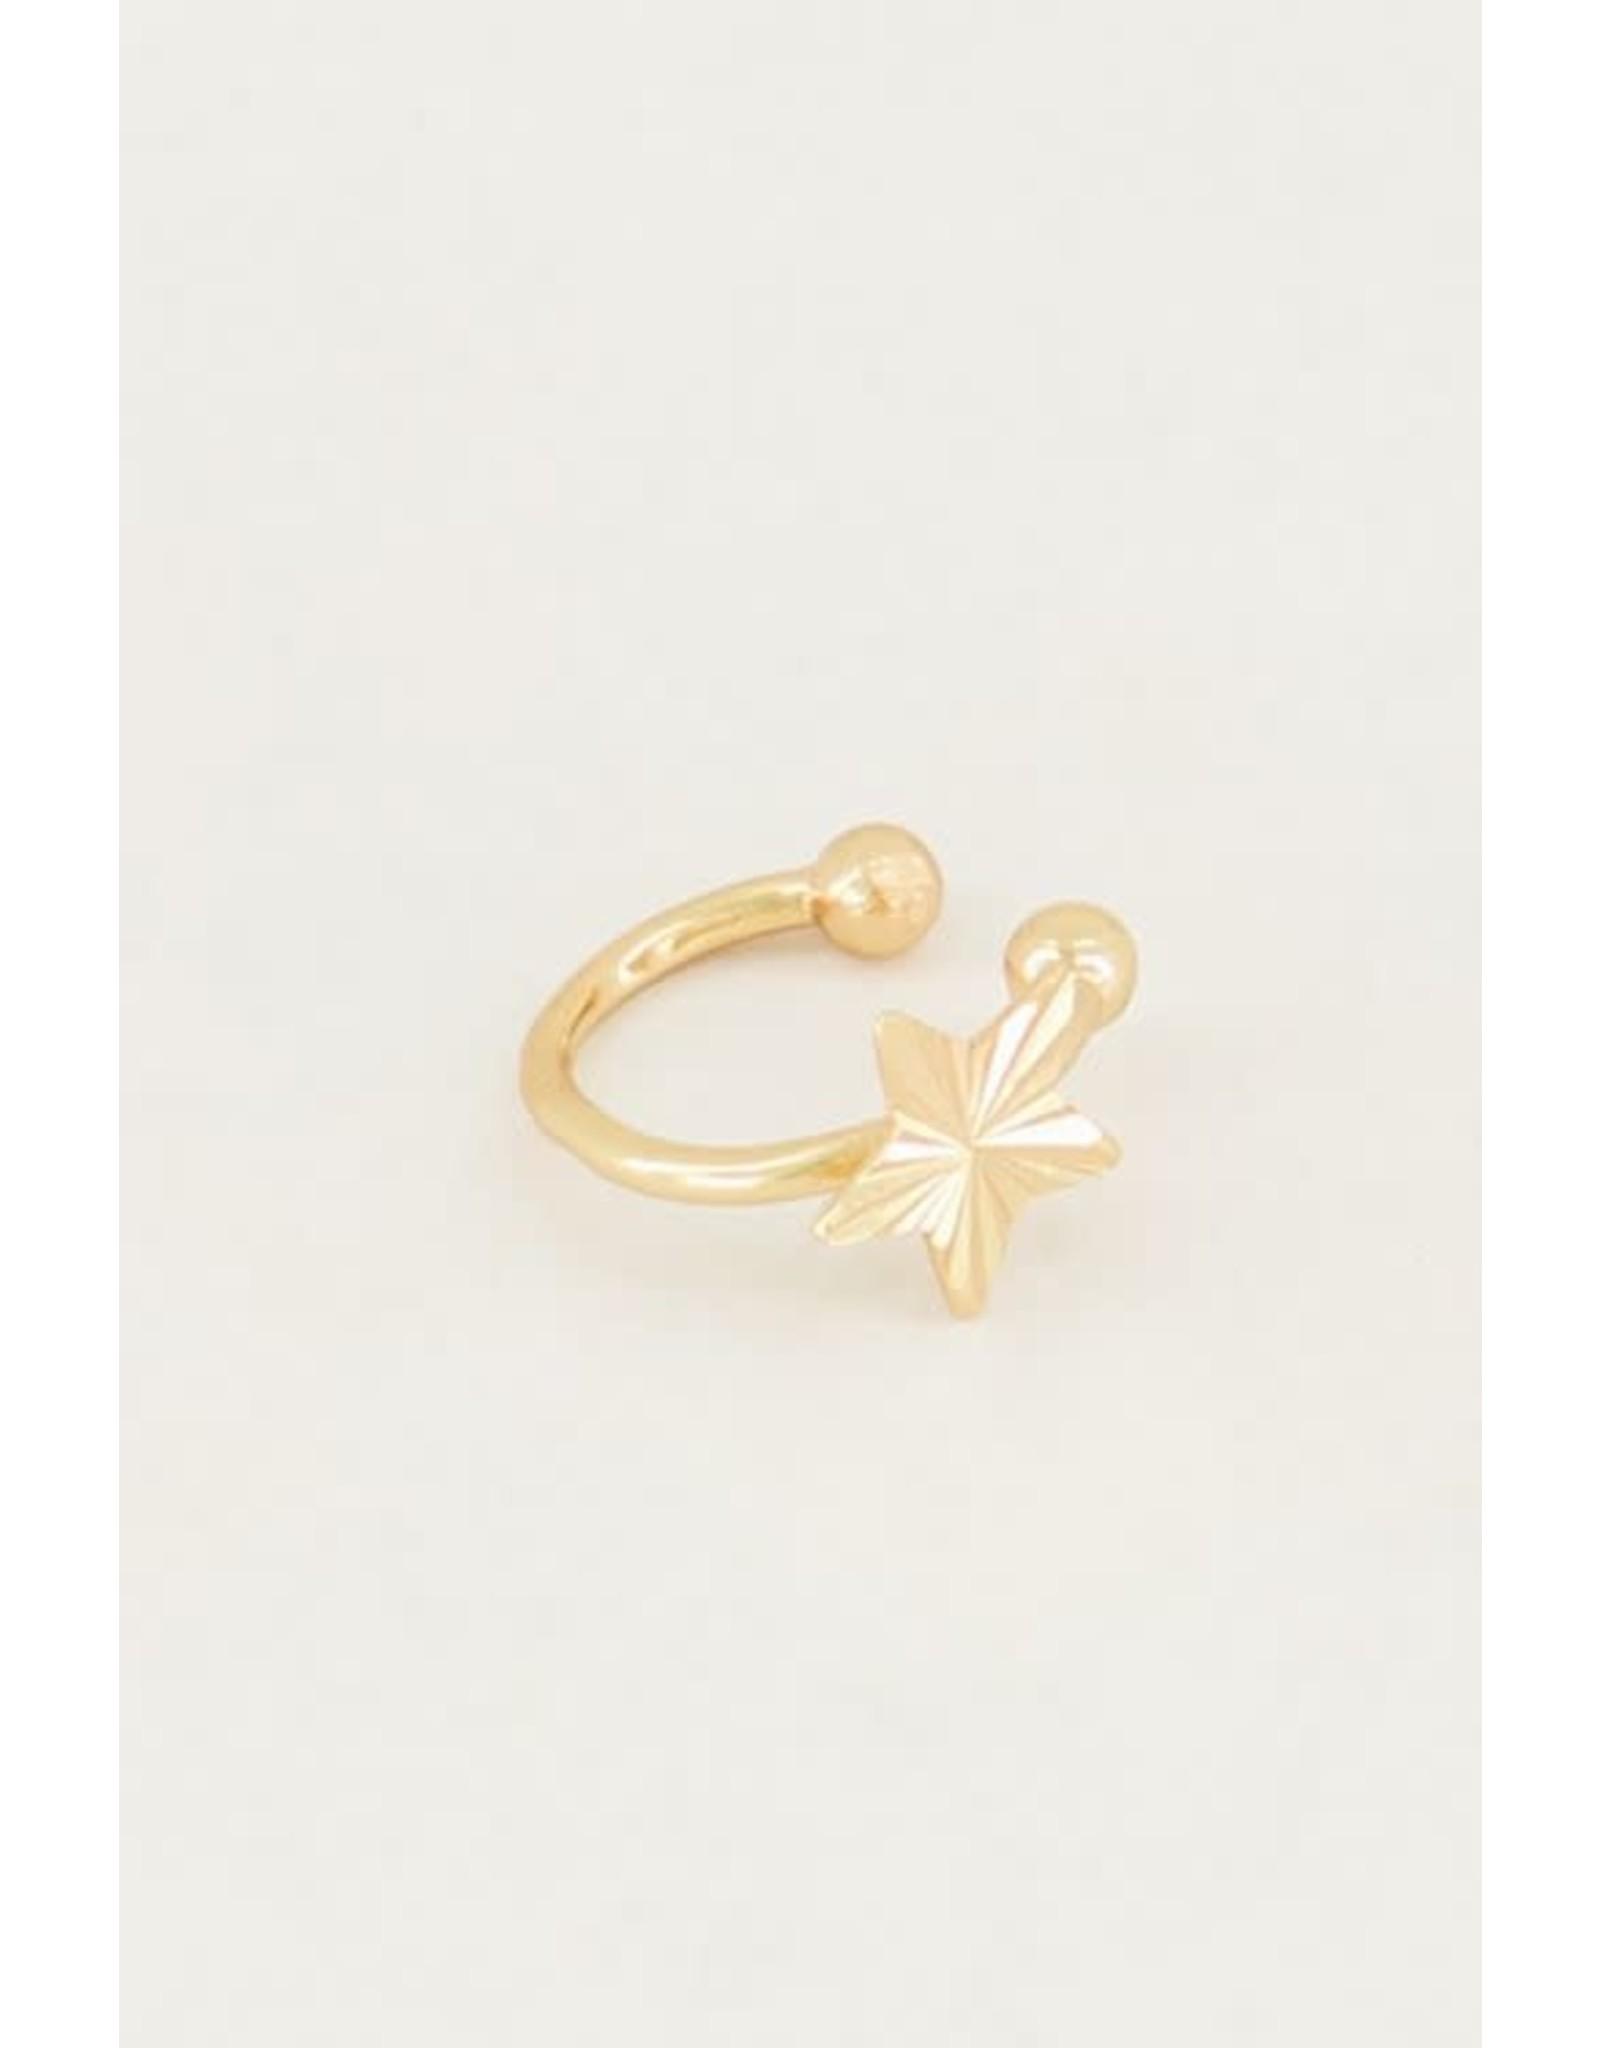 My Jewellery My Jewellery ear cuff sterretje